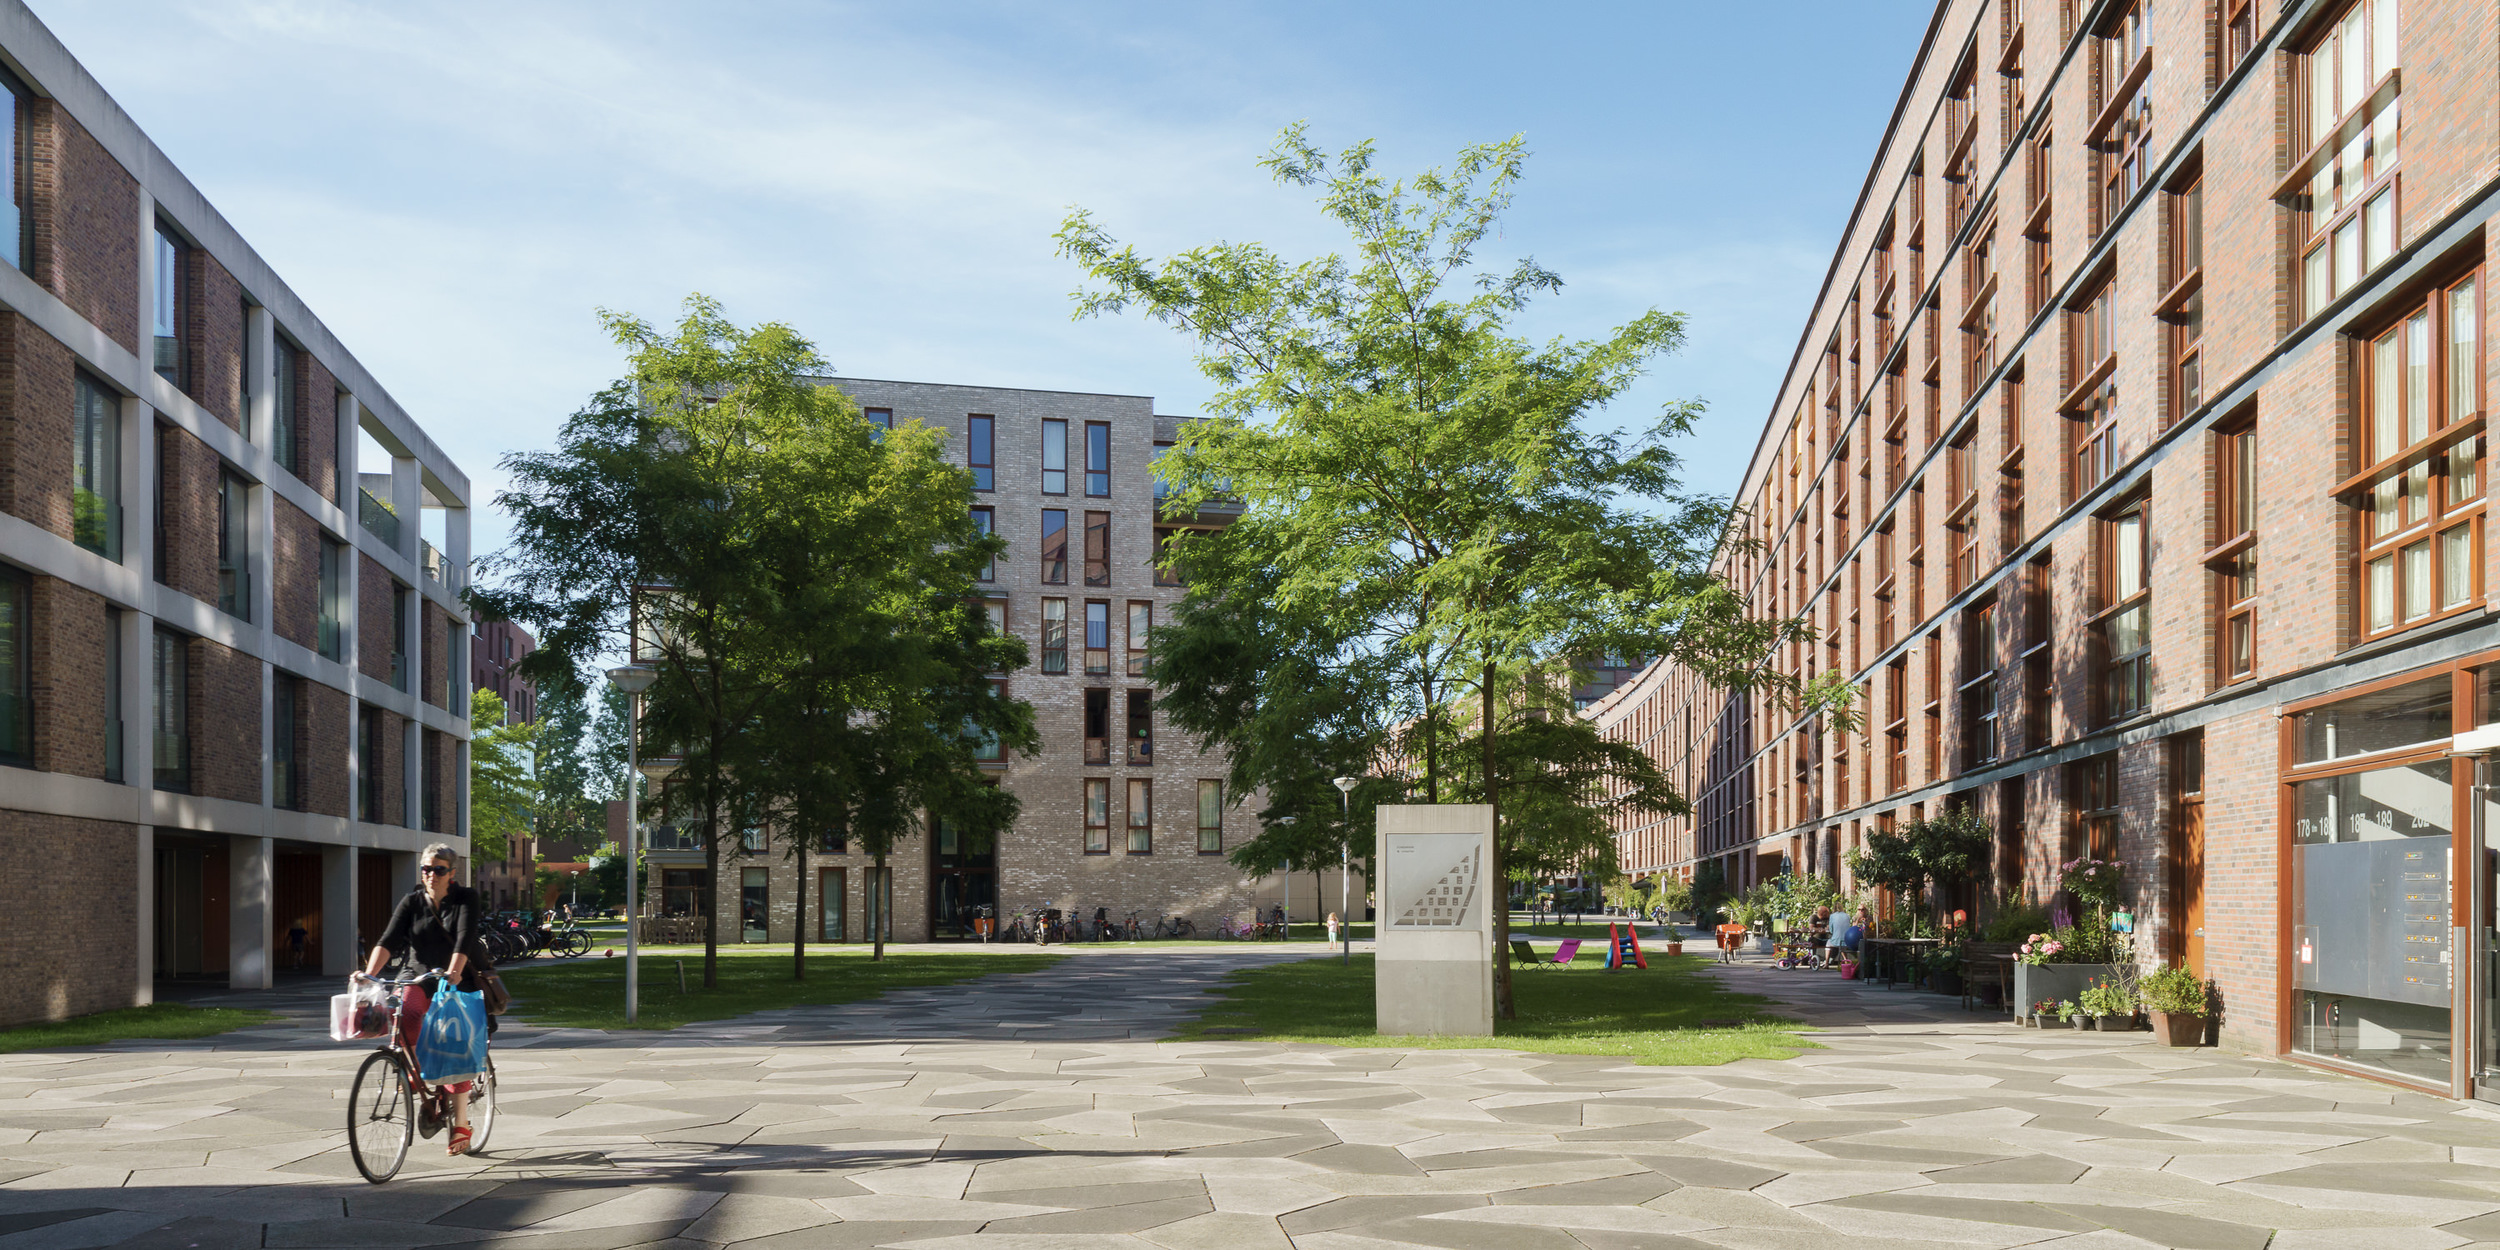 amsterdam-modern-architecture-facade-het-funen-mark-hadden-photography-architectuurfotograaf-.jpg